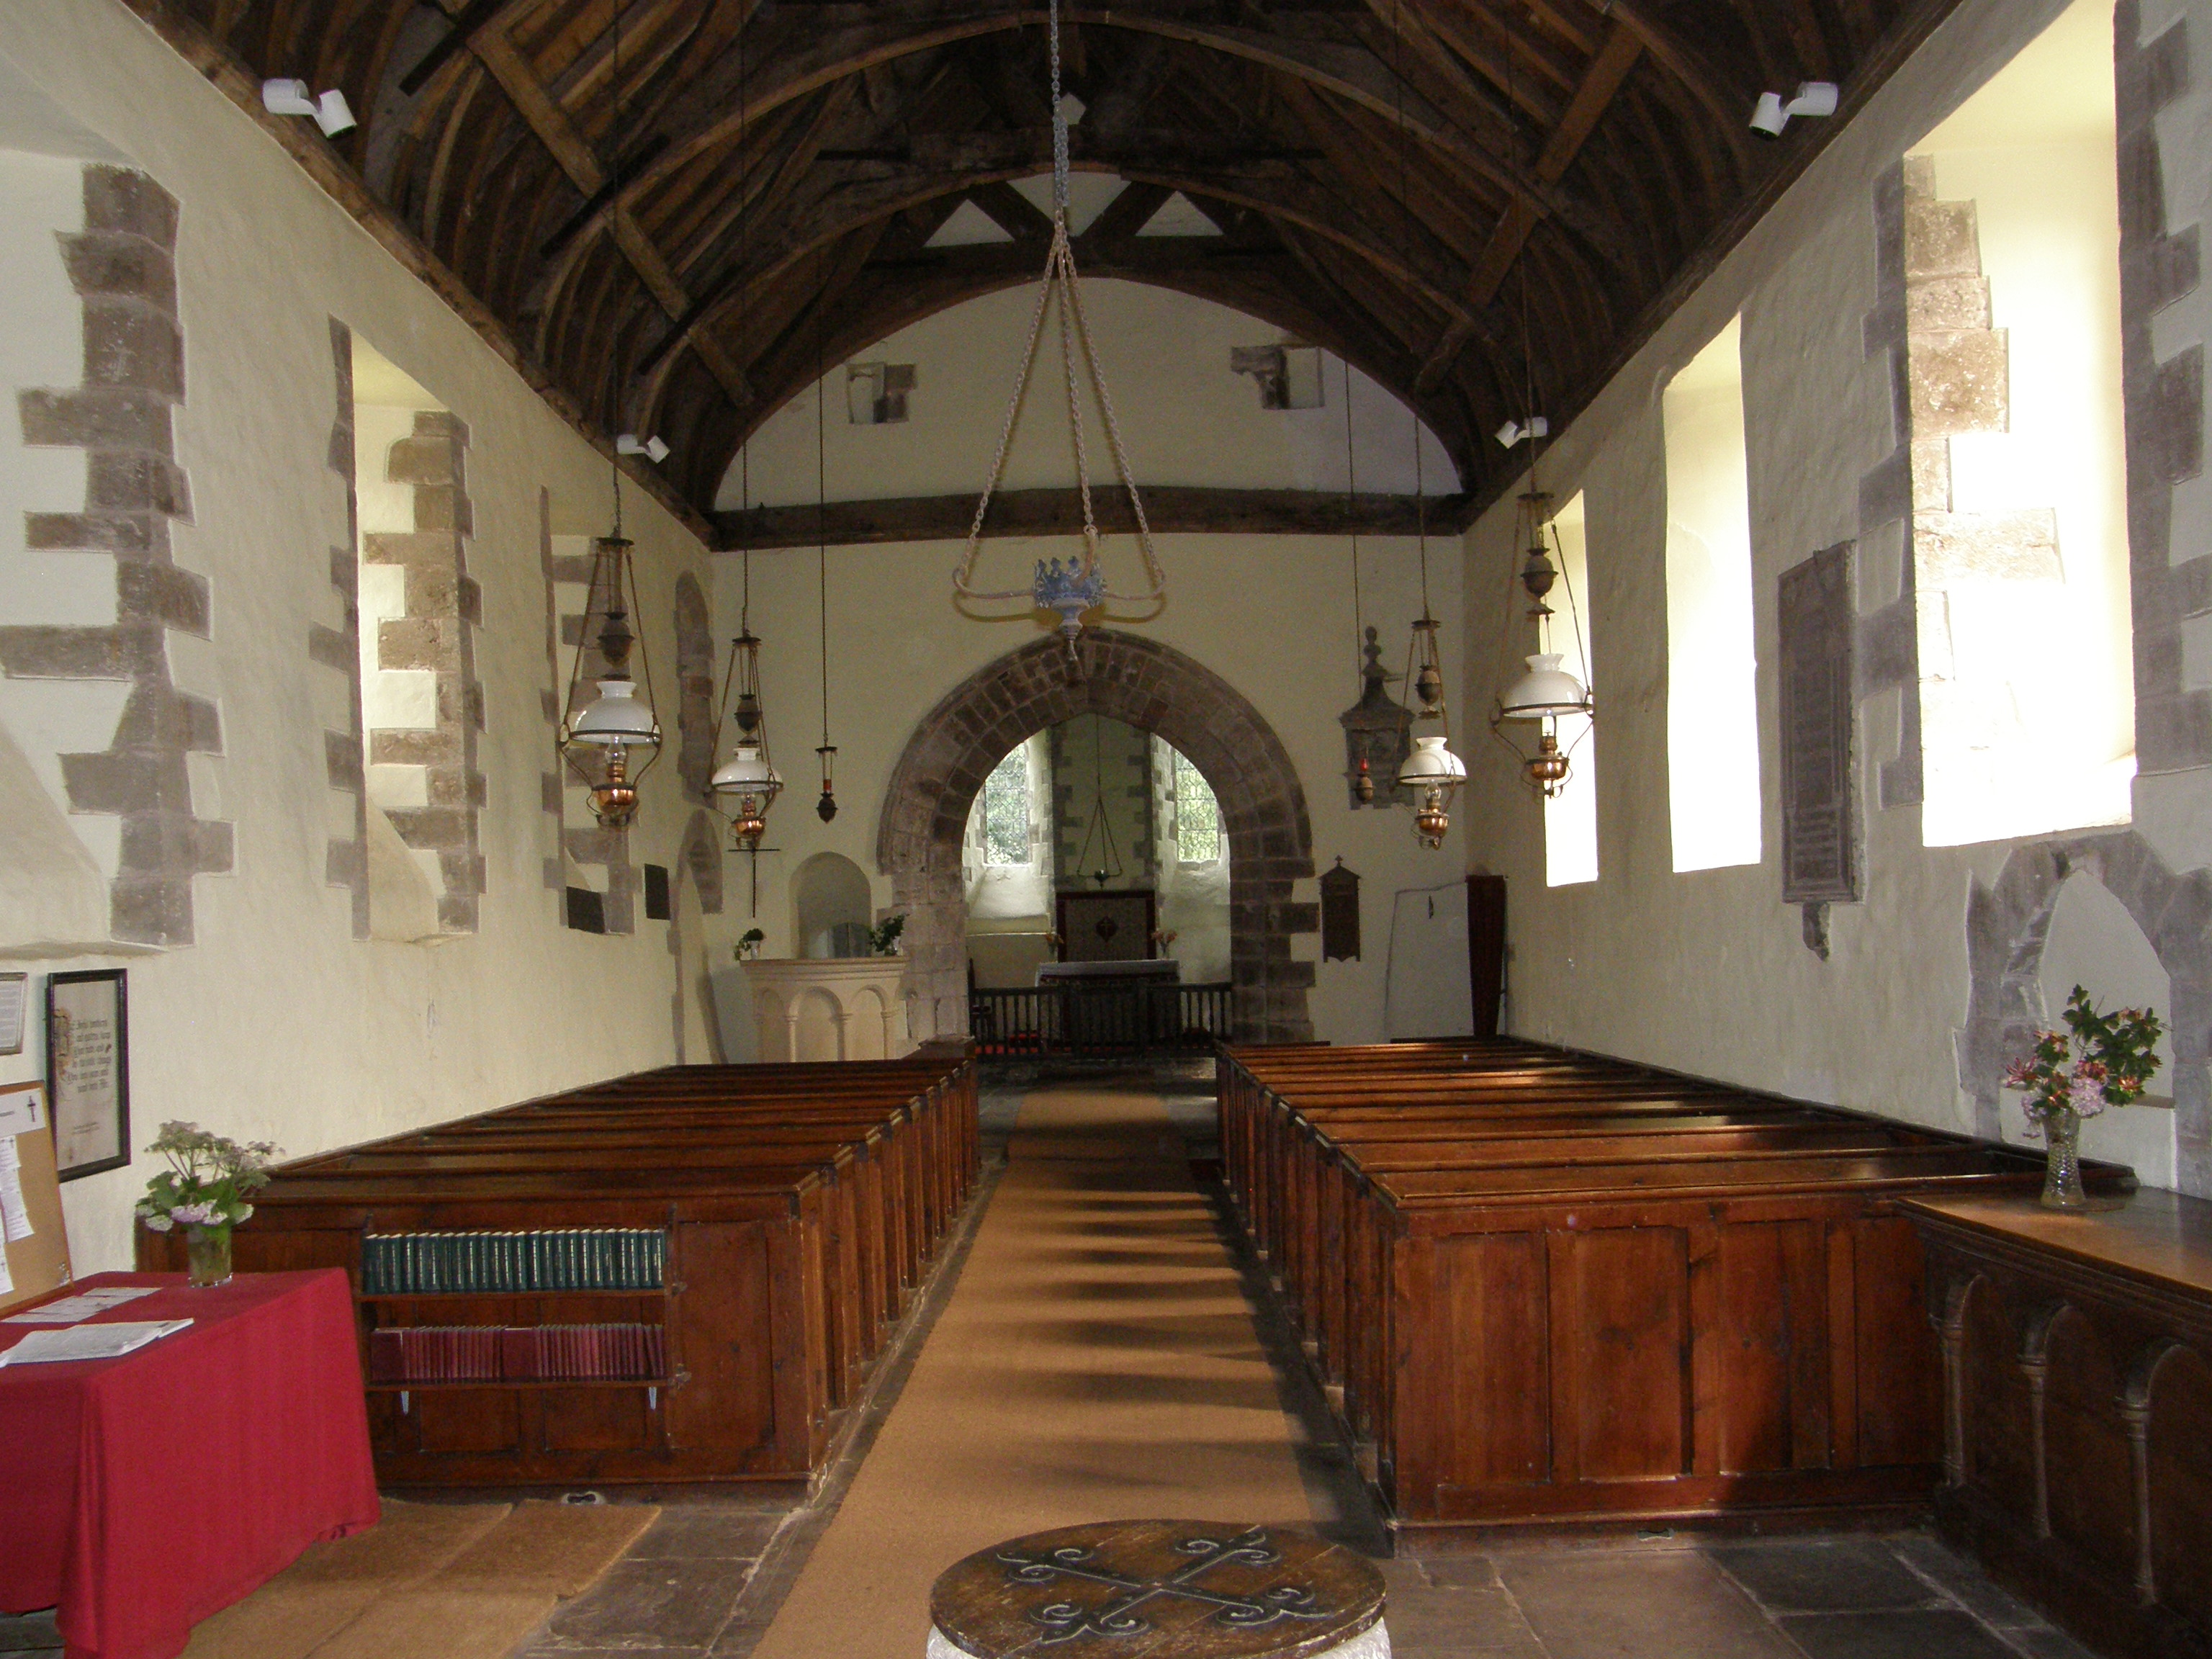 Interior of St Davids Parish Church, Llanthony, Wales